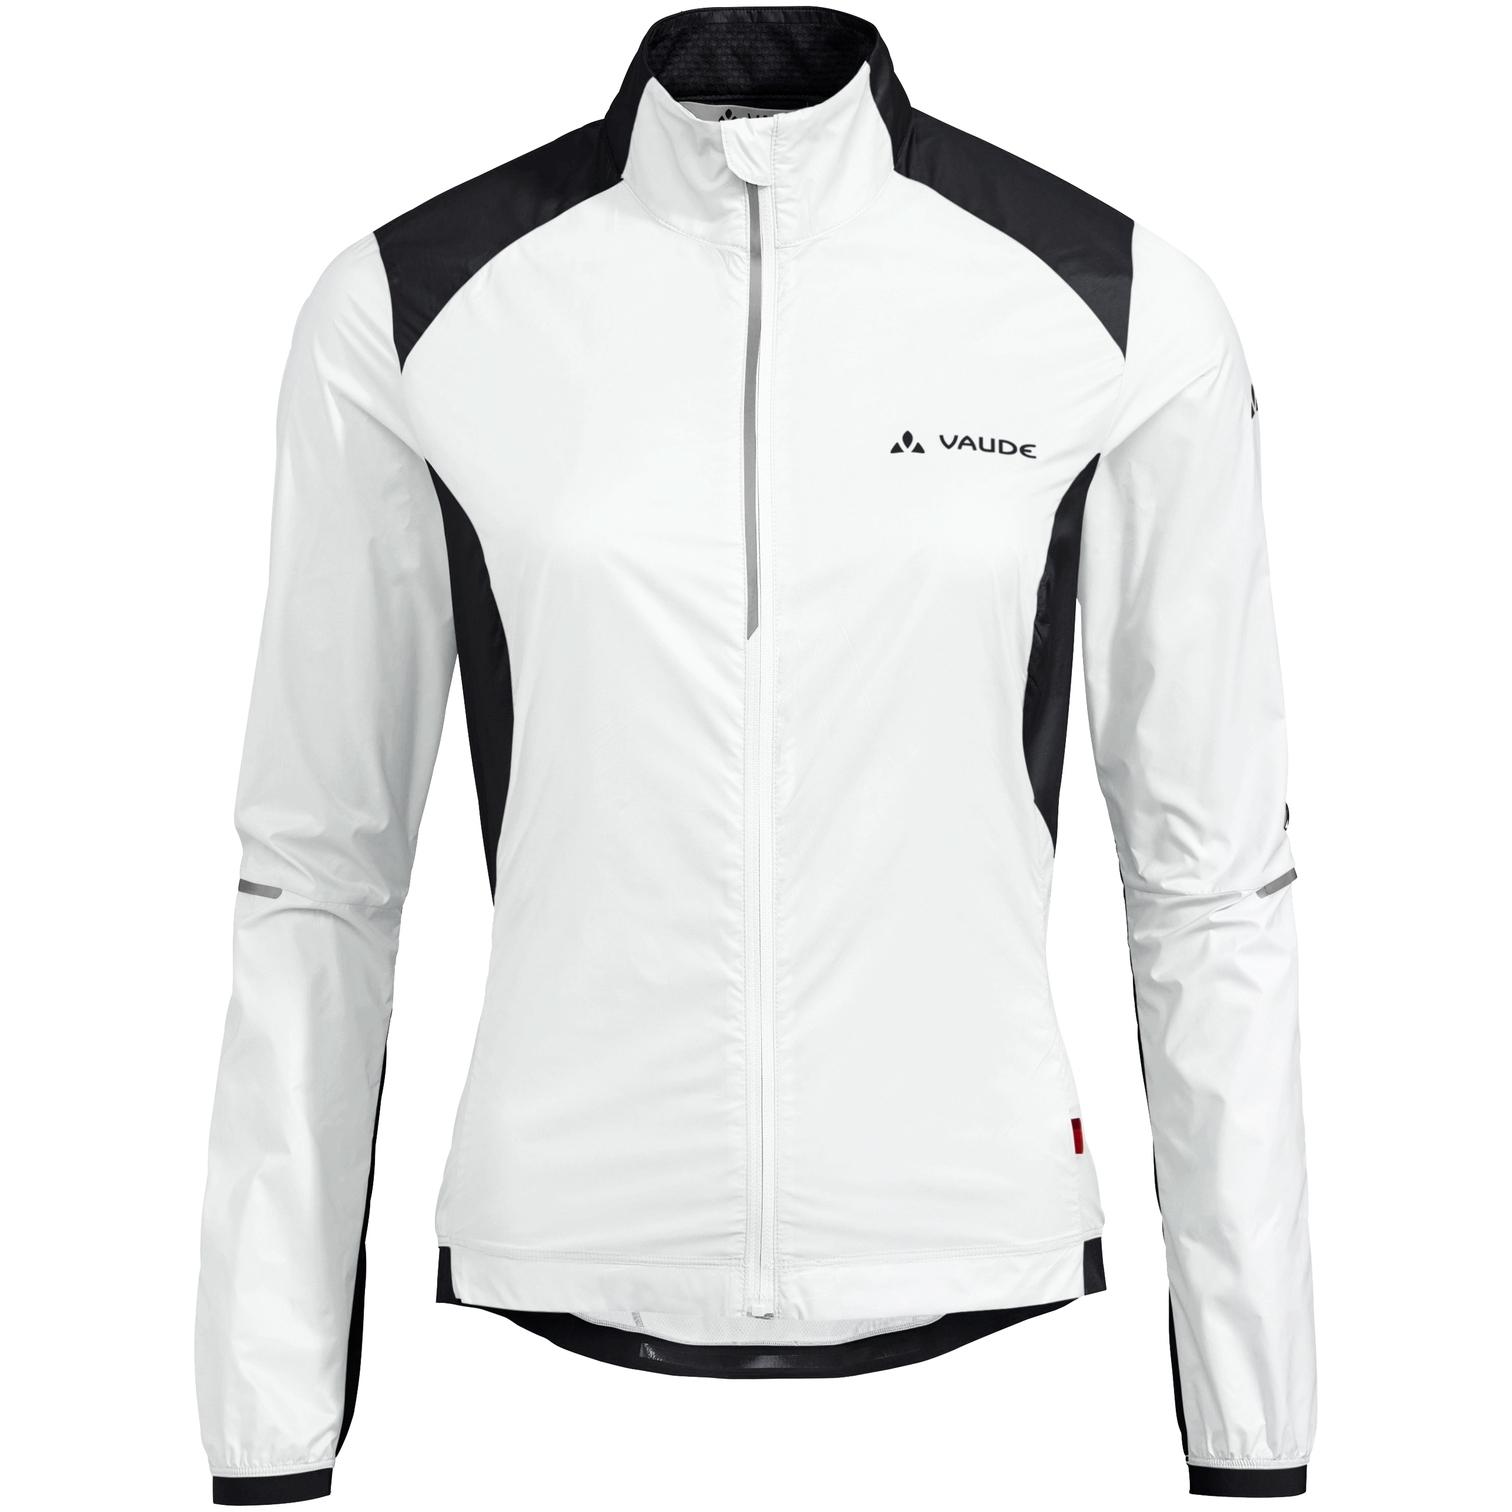 Vaude Air Pro Damen Windjacke - white/black